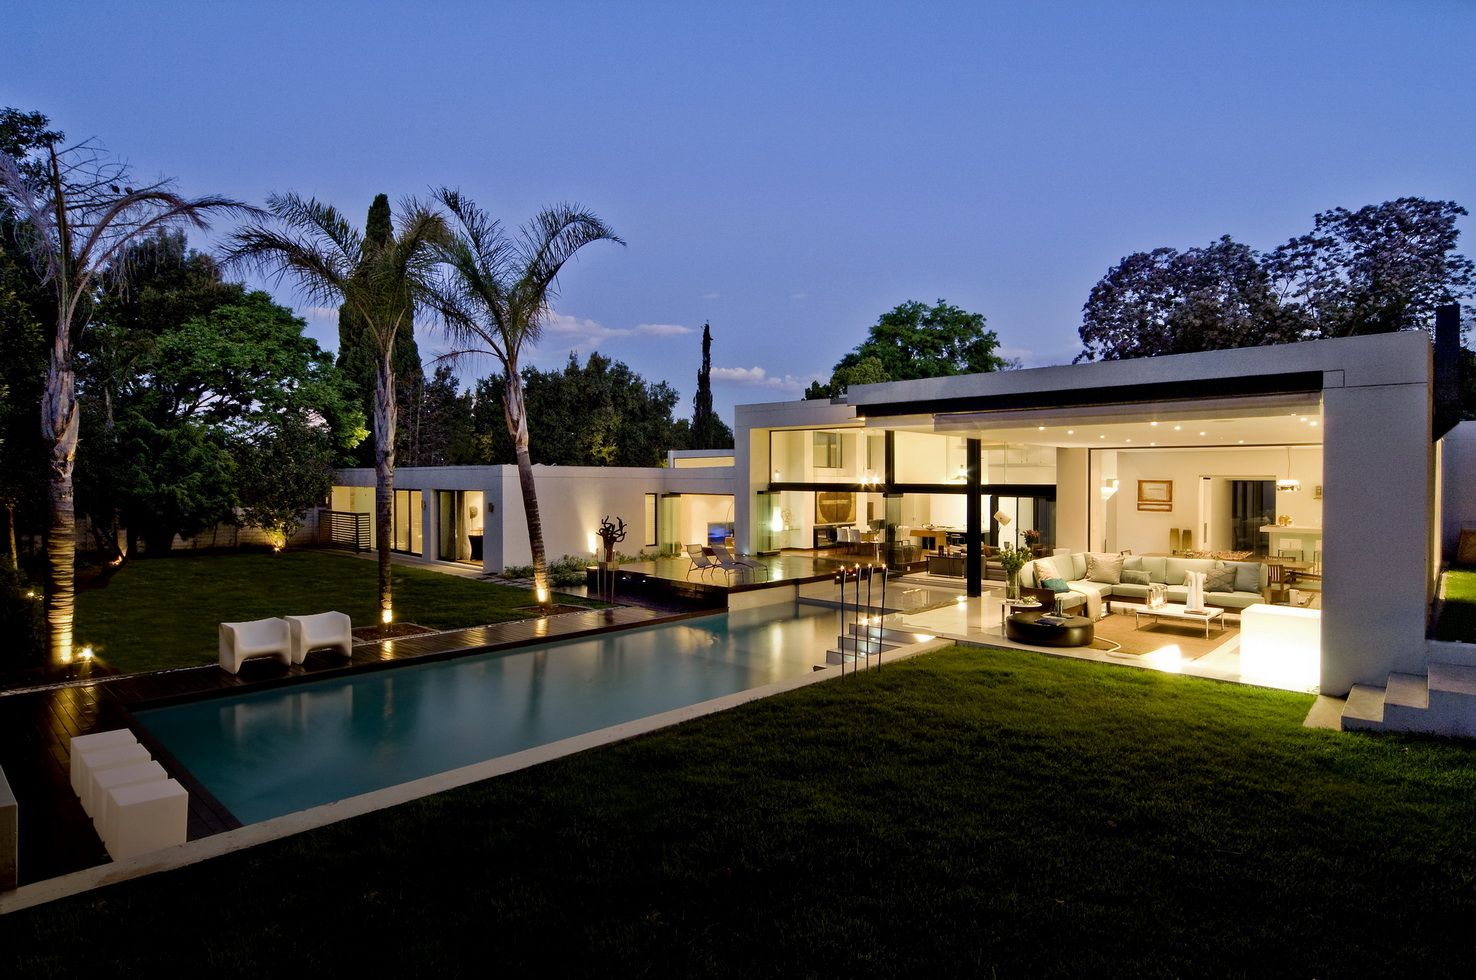 Nico van der Meulen Architects - Project - House Mosi